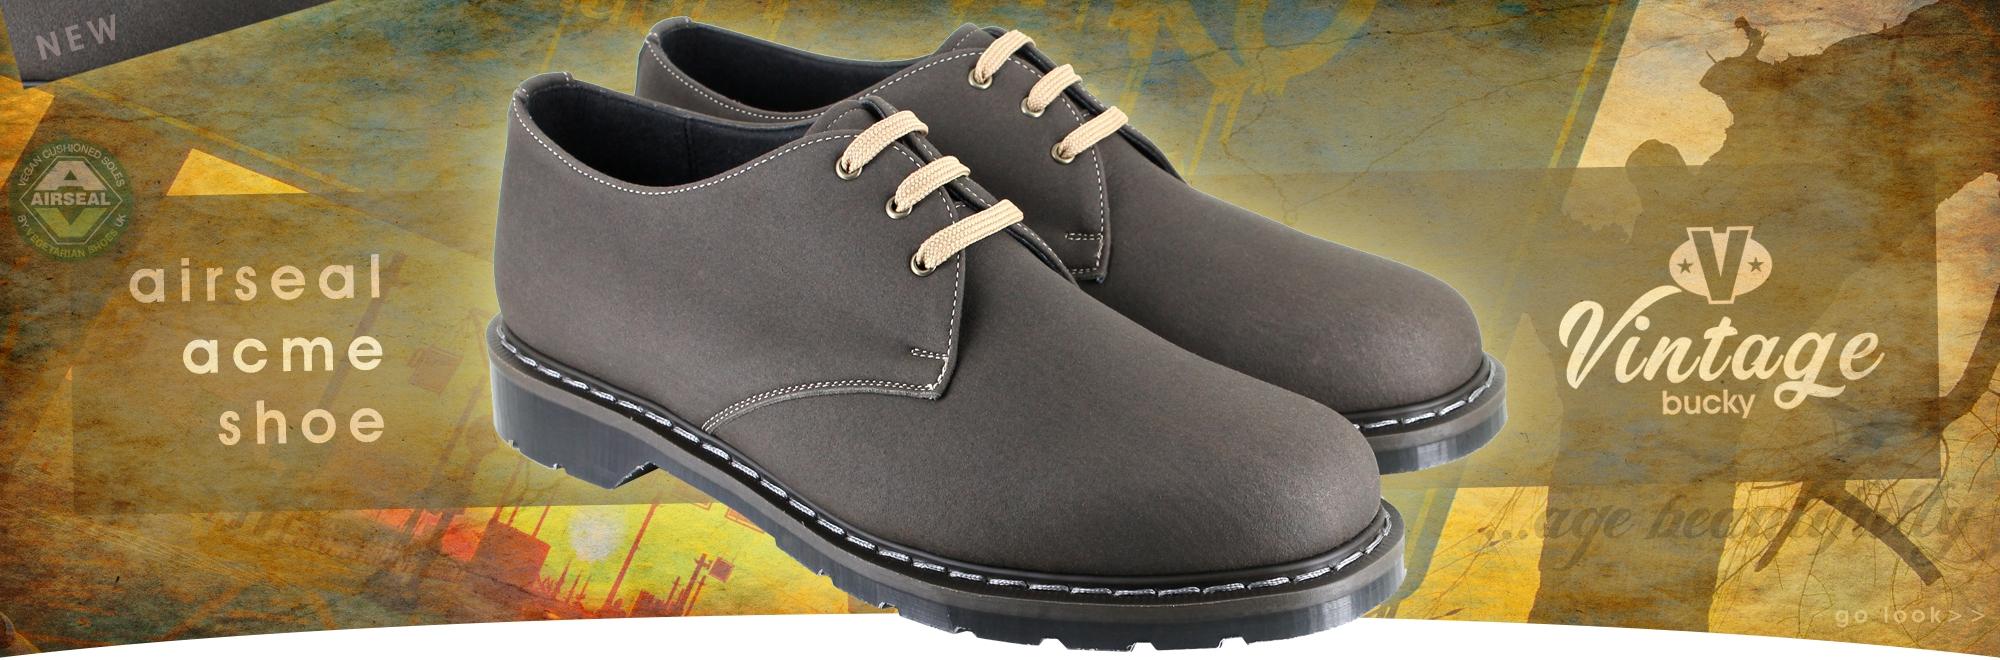 da99c22e2cb2 VEGAN FOOTWEAR by Vegetarian Shoes. Made in UK and Europe